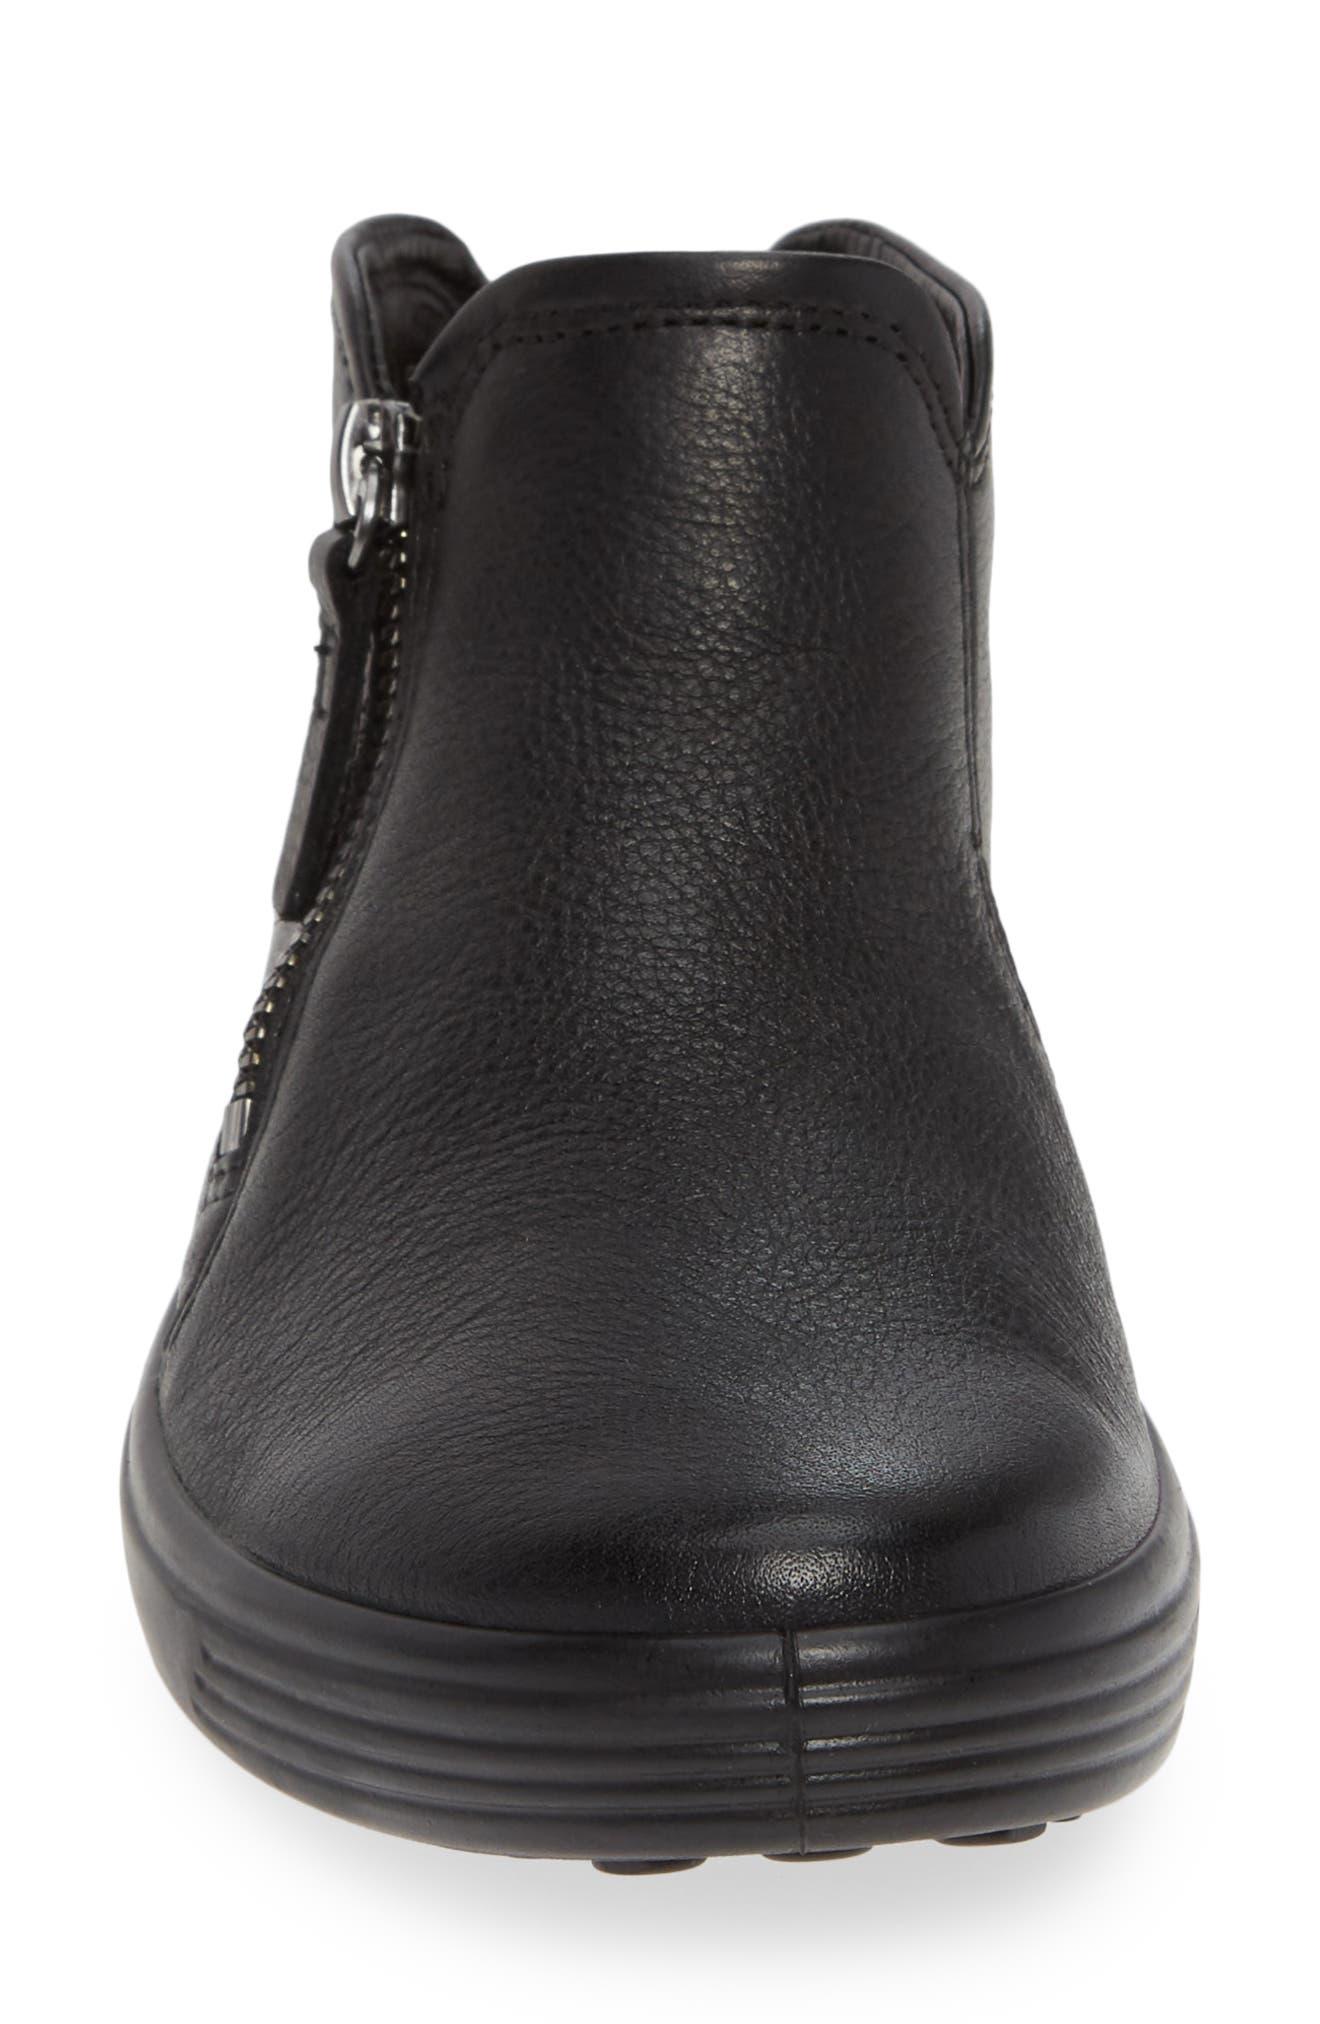 ECCO, Soft 7 Mid Top Sneaker, Alternate thumbnail 4, color, BLACK/ BLACK LEATHER